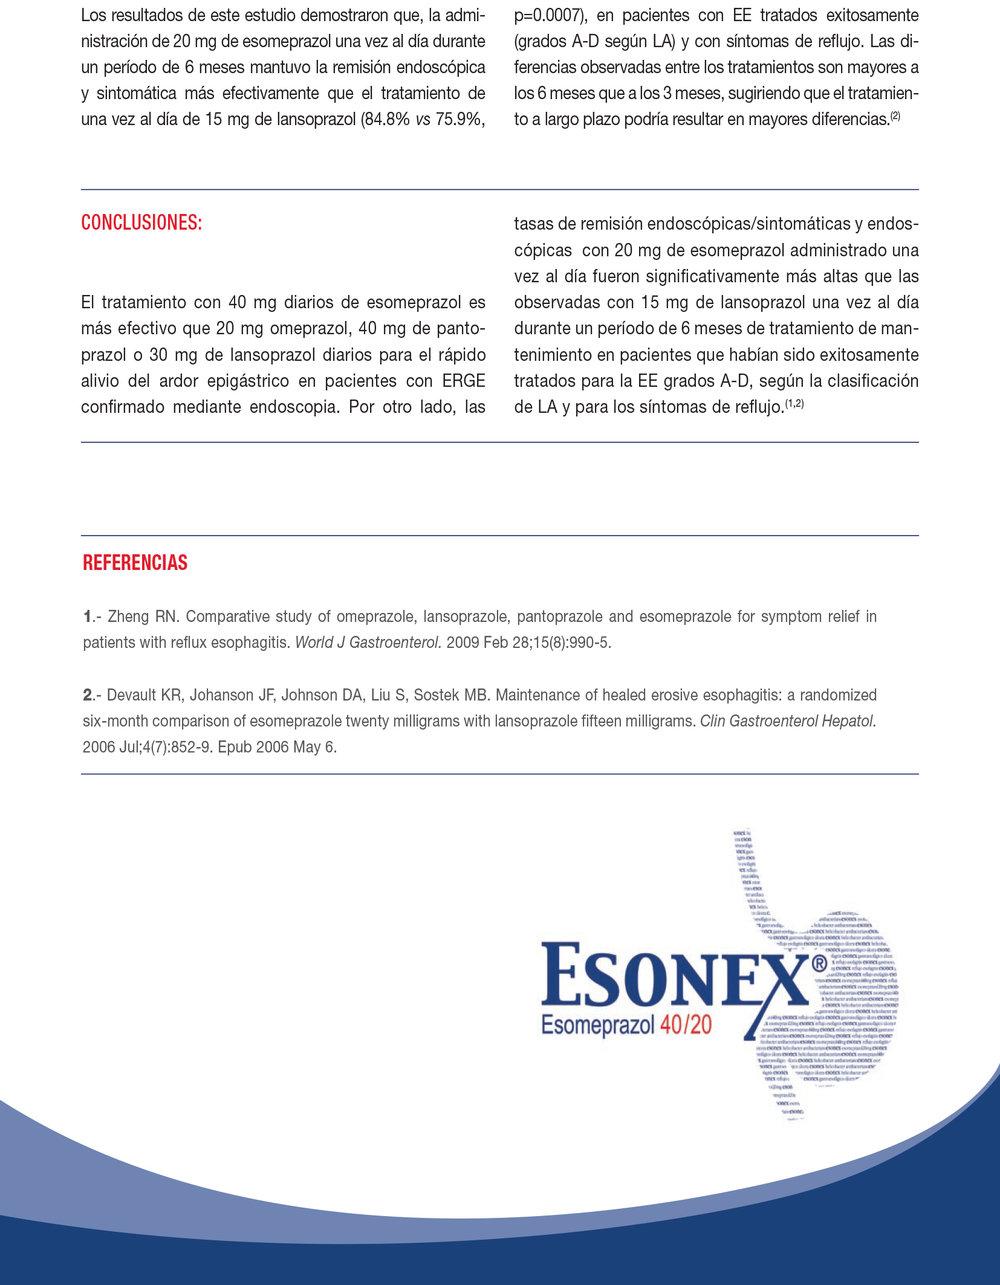 Esonex_Noticias4.jpg